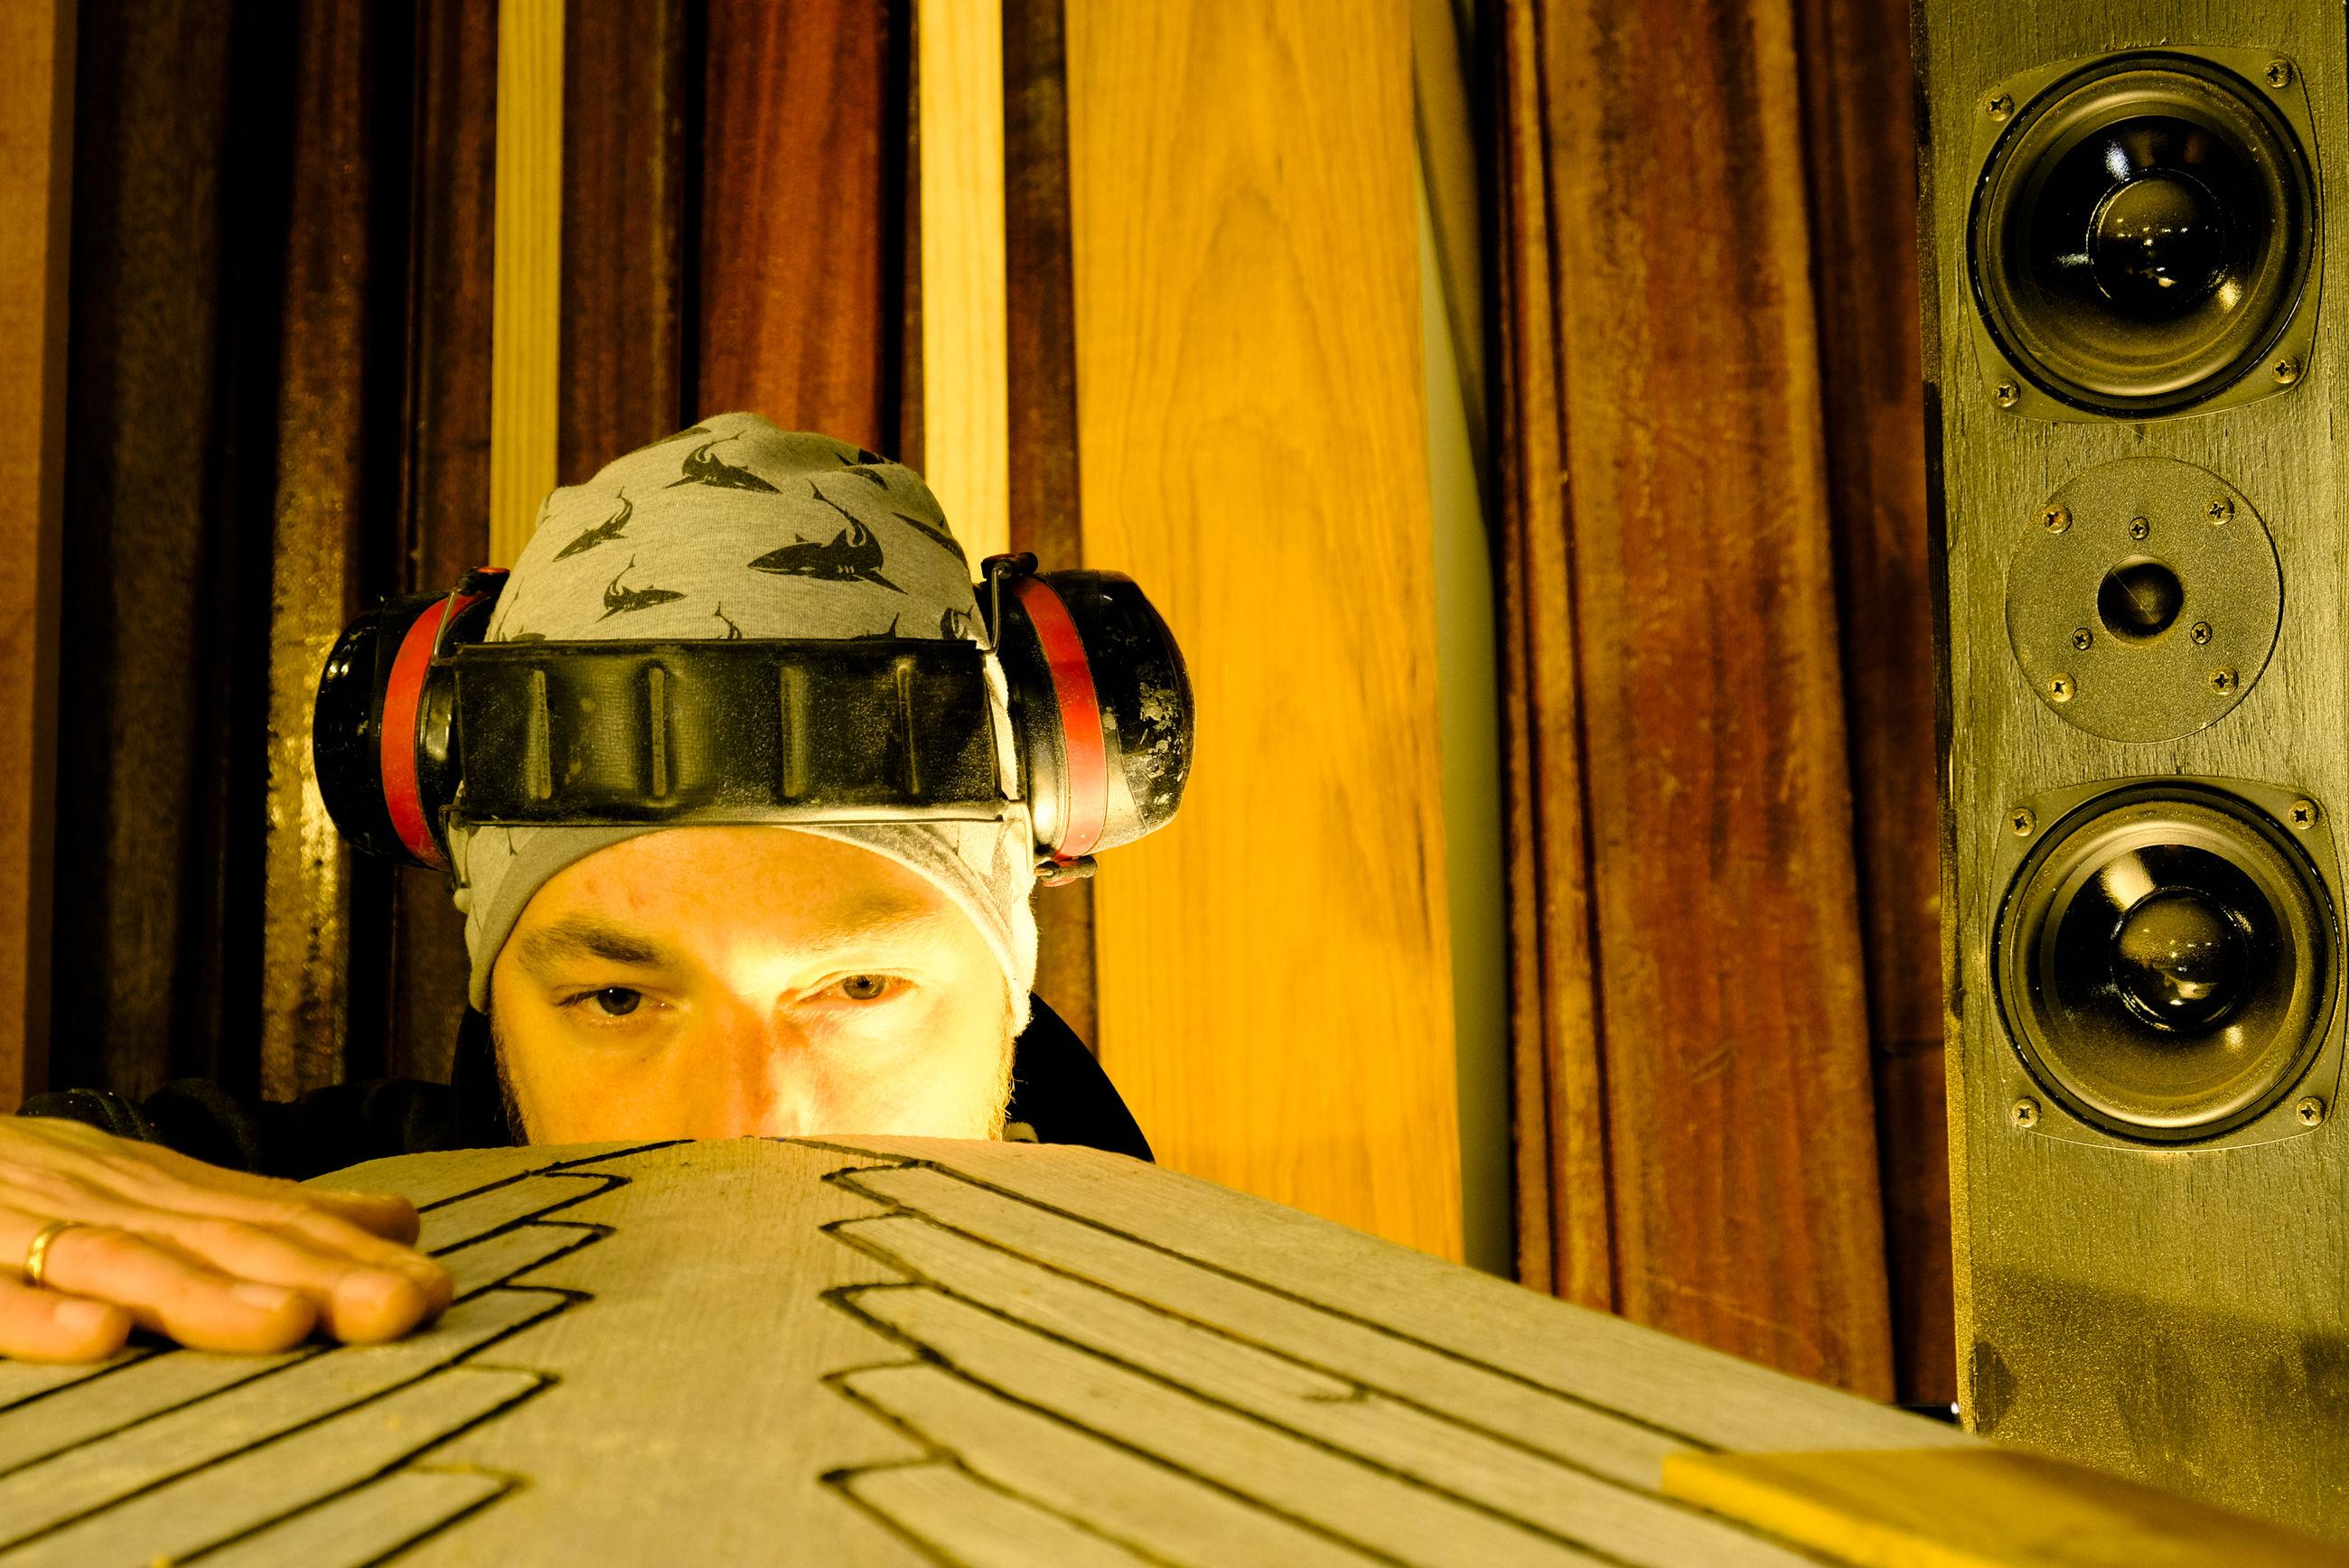 Headshot of man listening music while working on yacht model